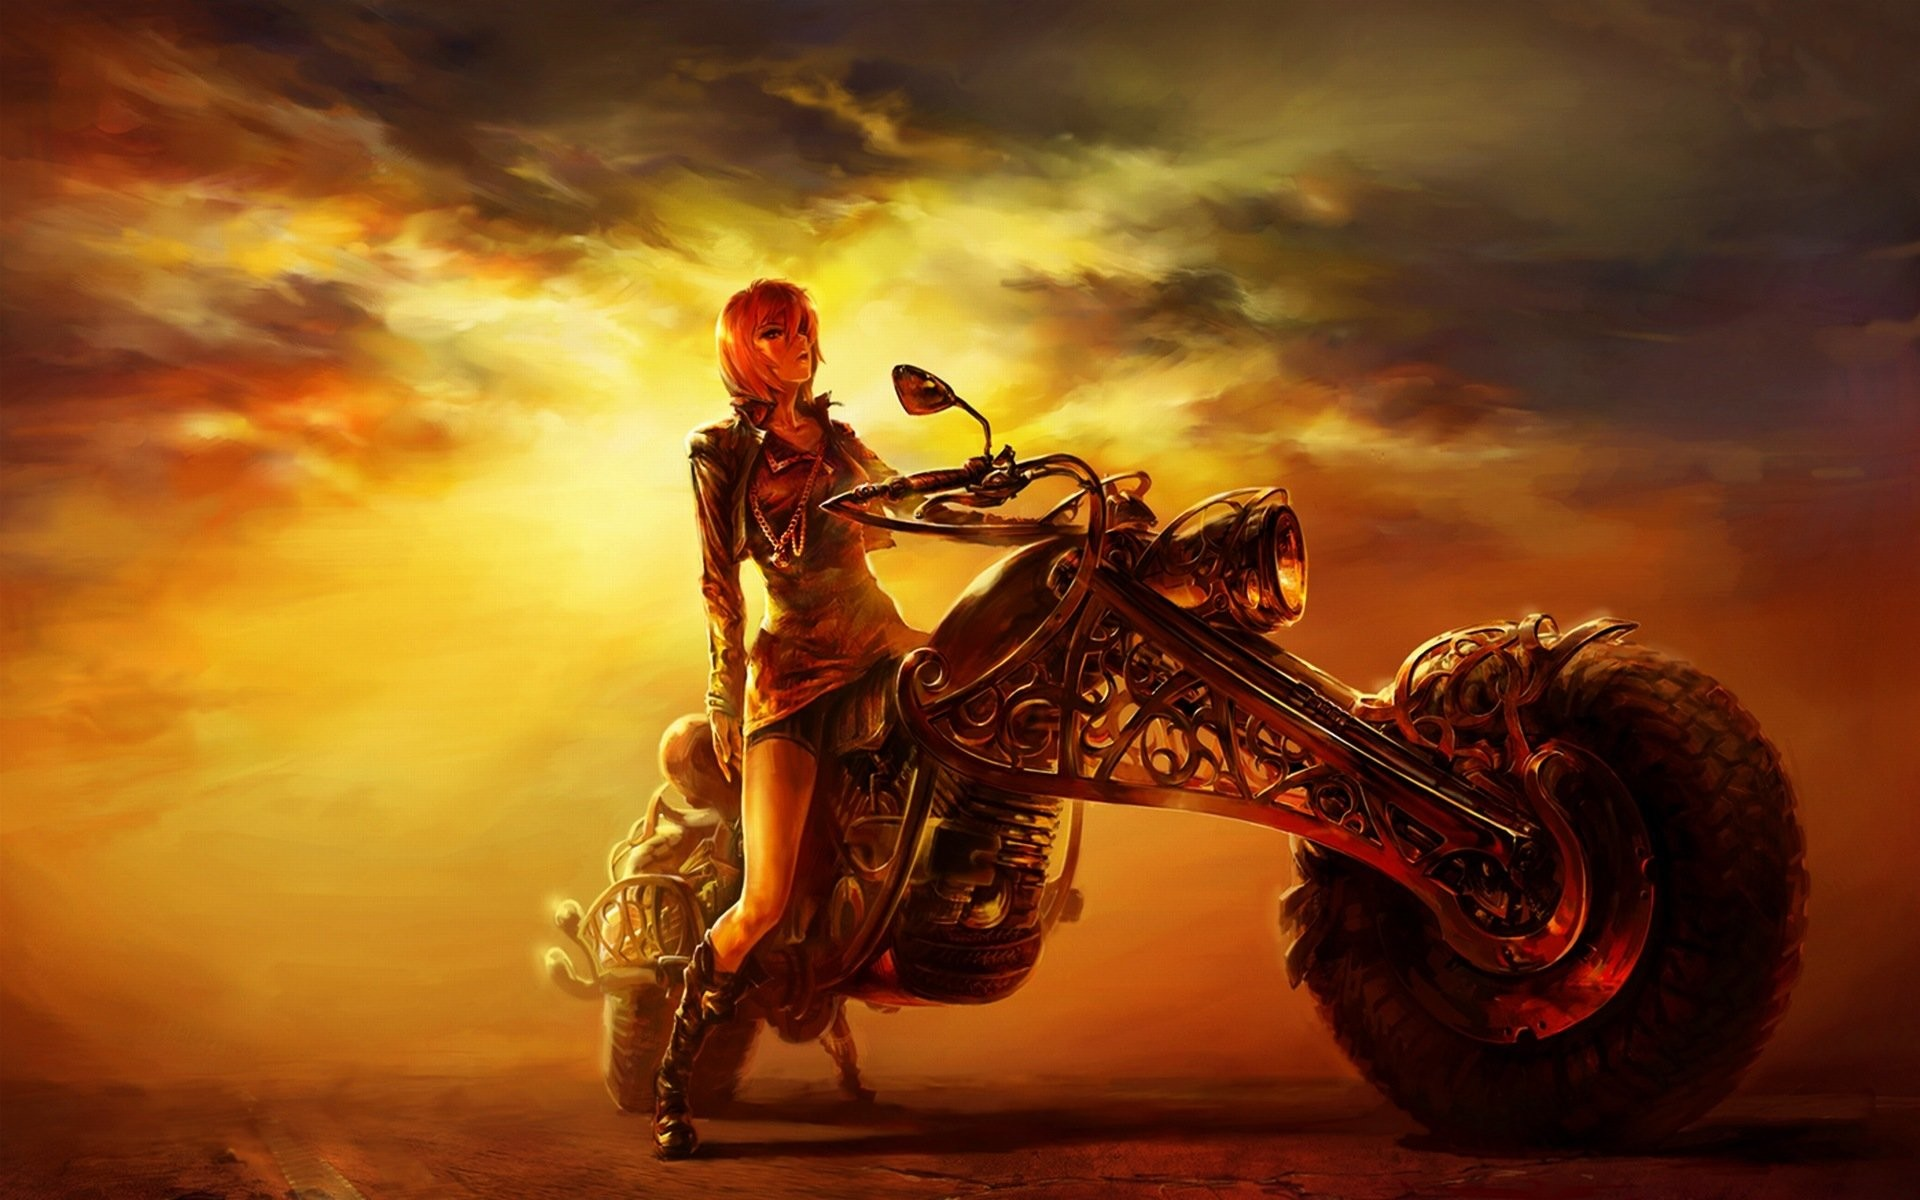 Motorcycle – Art Girl Sunset Wallpaper At Dark Wallpapers